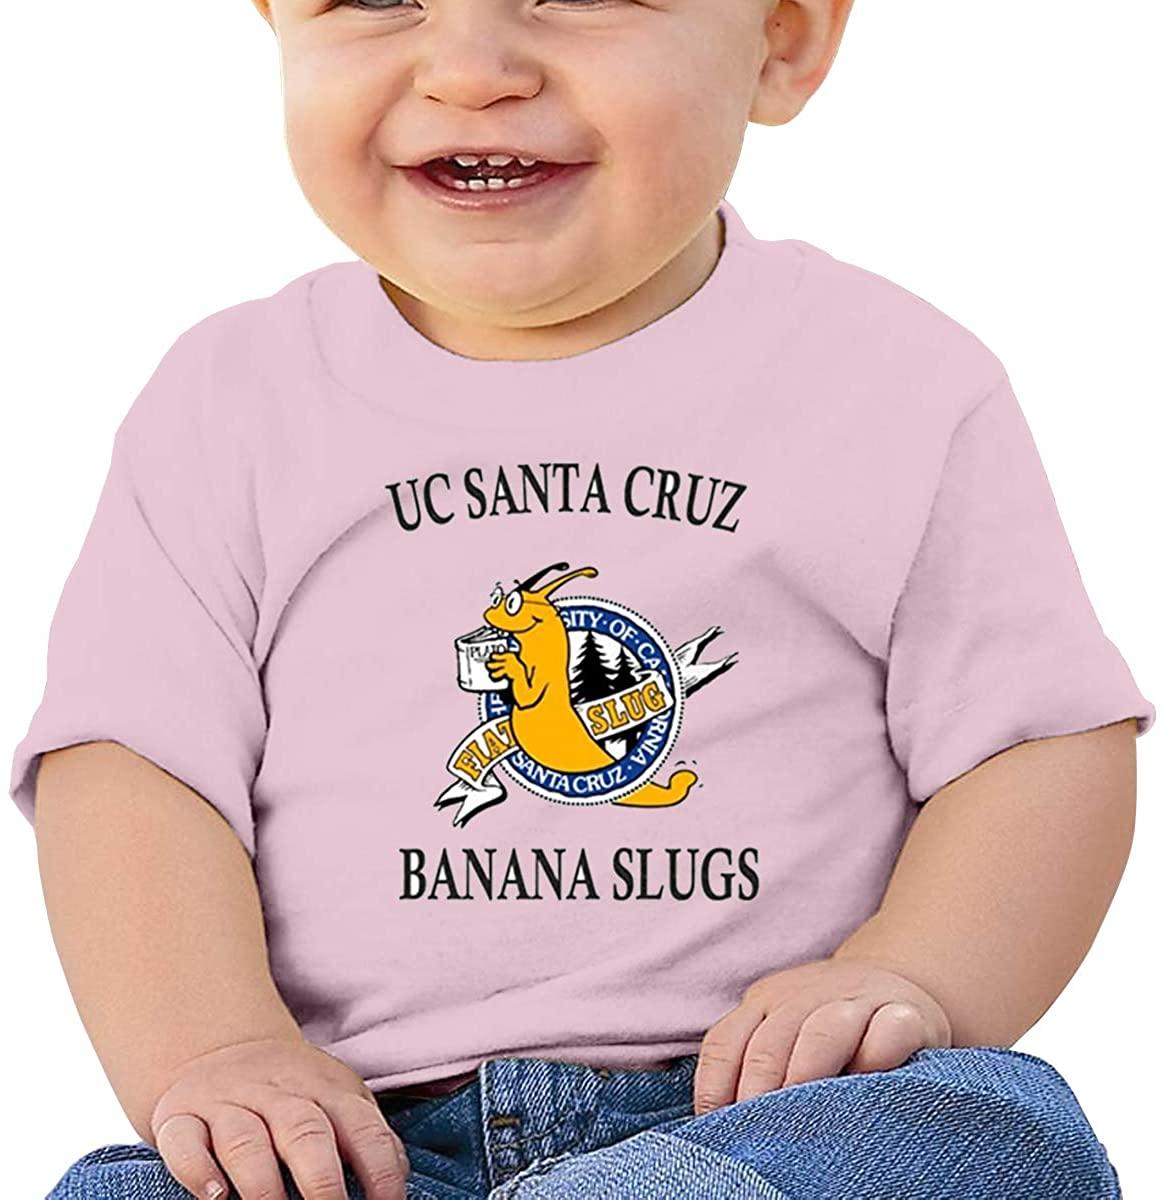 6-24 Months Boy and Girl Baby Short Sleeve T-Shirt Uc Santa Cruz Banana Slug Elegant and Simple Design Pink